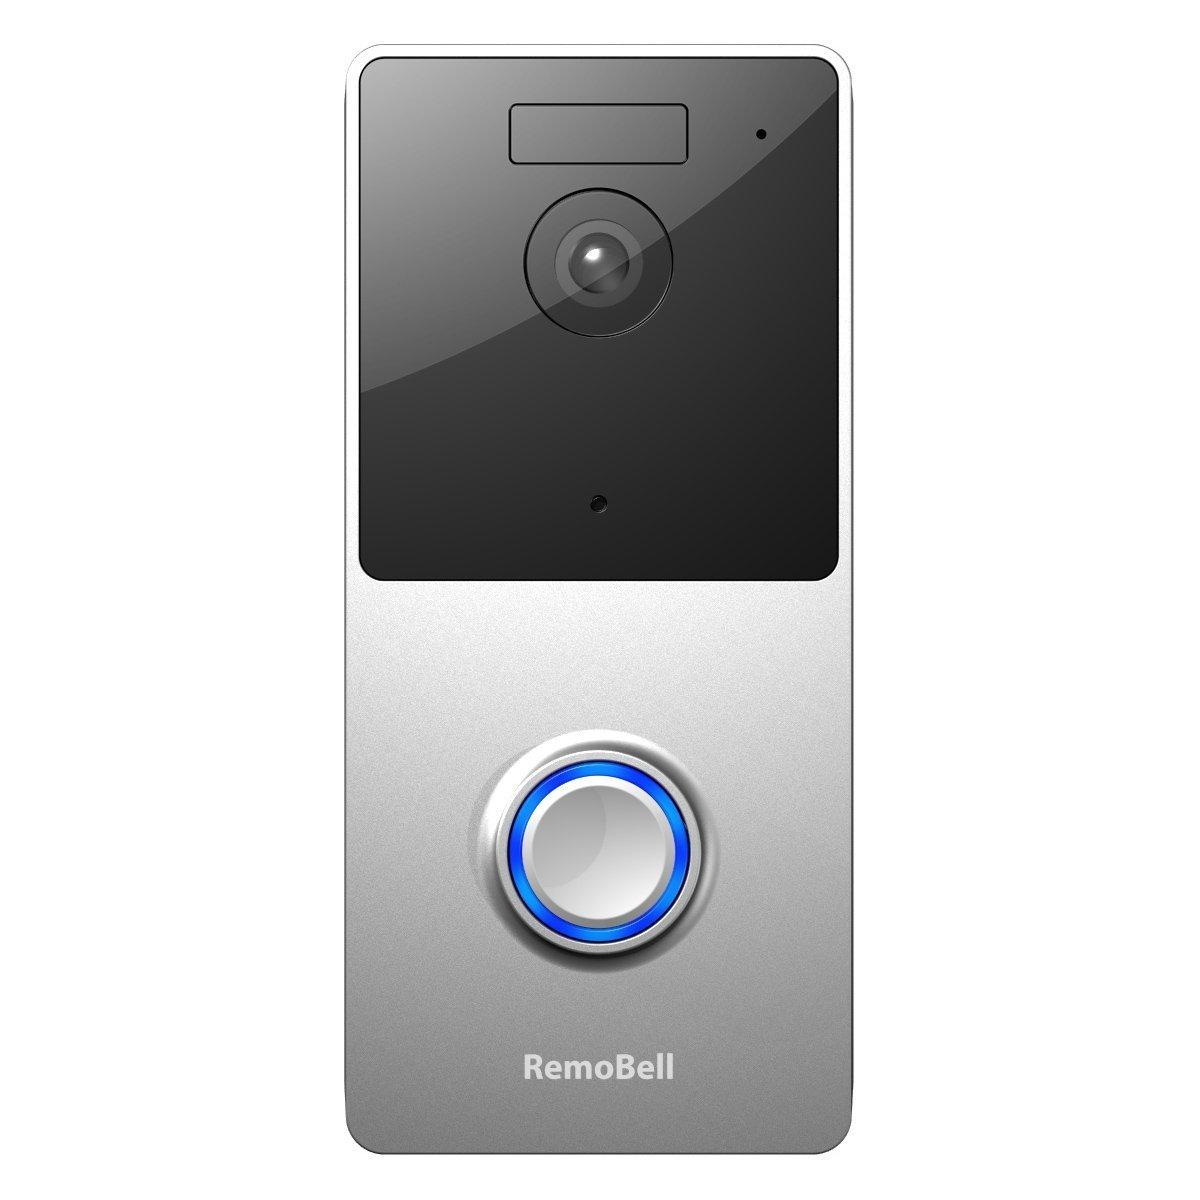 remo+ RemoBell WiFi Wireless Video Doorbell (Battery Powered, Night Vision, 2-Way Audio, HD Video, Motion Sensor, Door Camera)